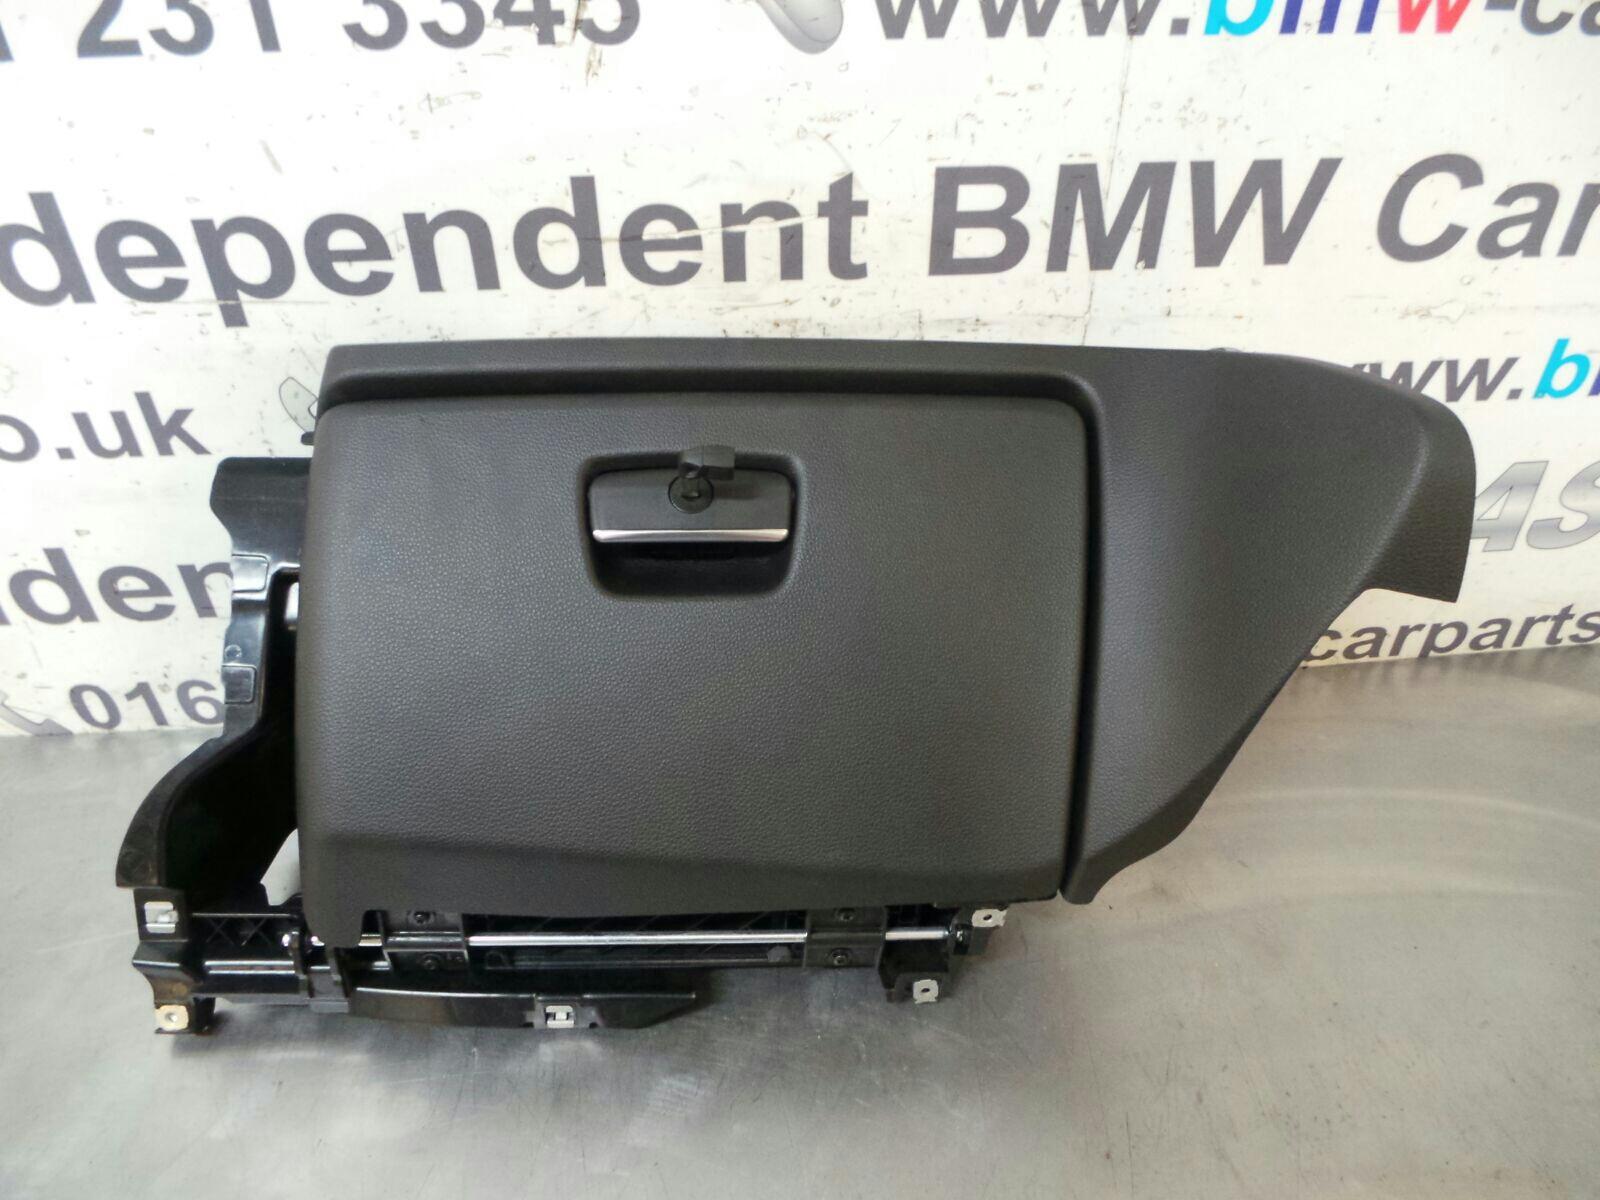 Bmw E82 E88 1 Series Coupe Convertible Glove Box 51169121797 Fuse